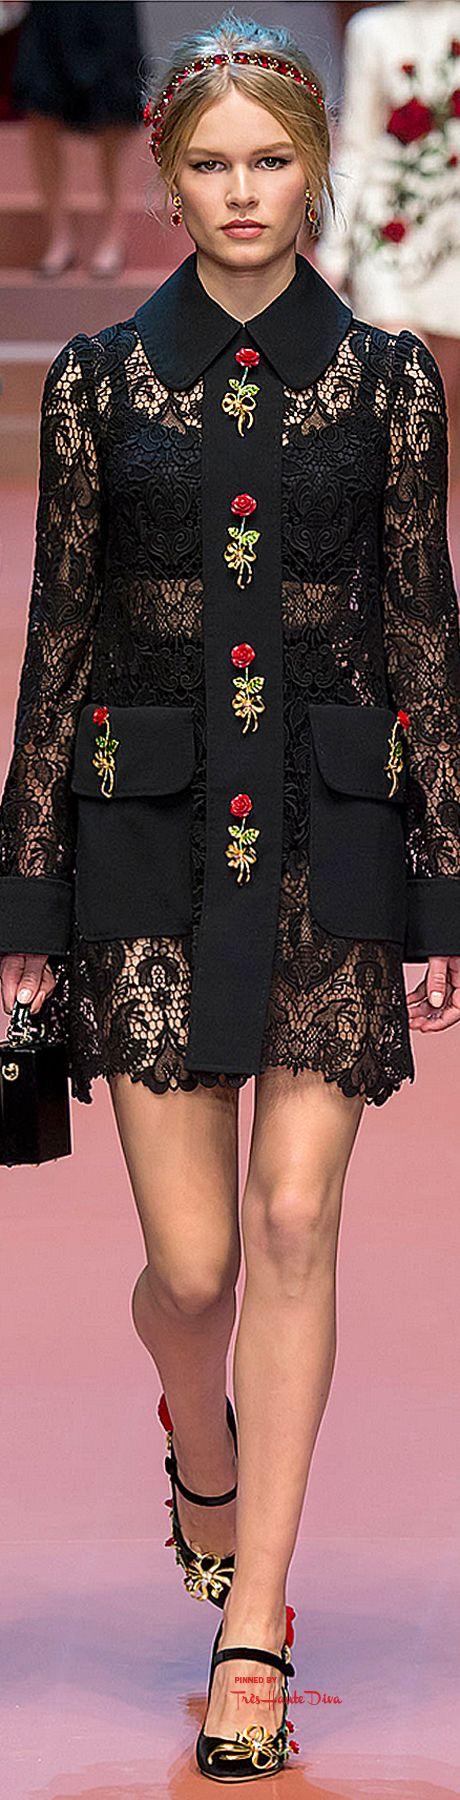 #MFW Dolce & Gabbana Fall 2015 RTW ♔THD♔                              …